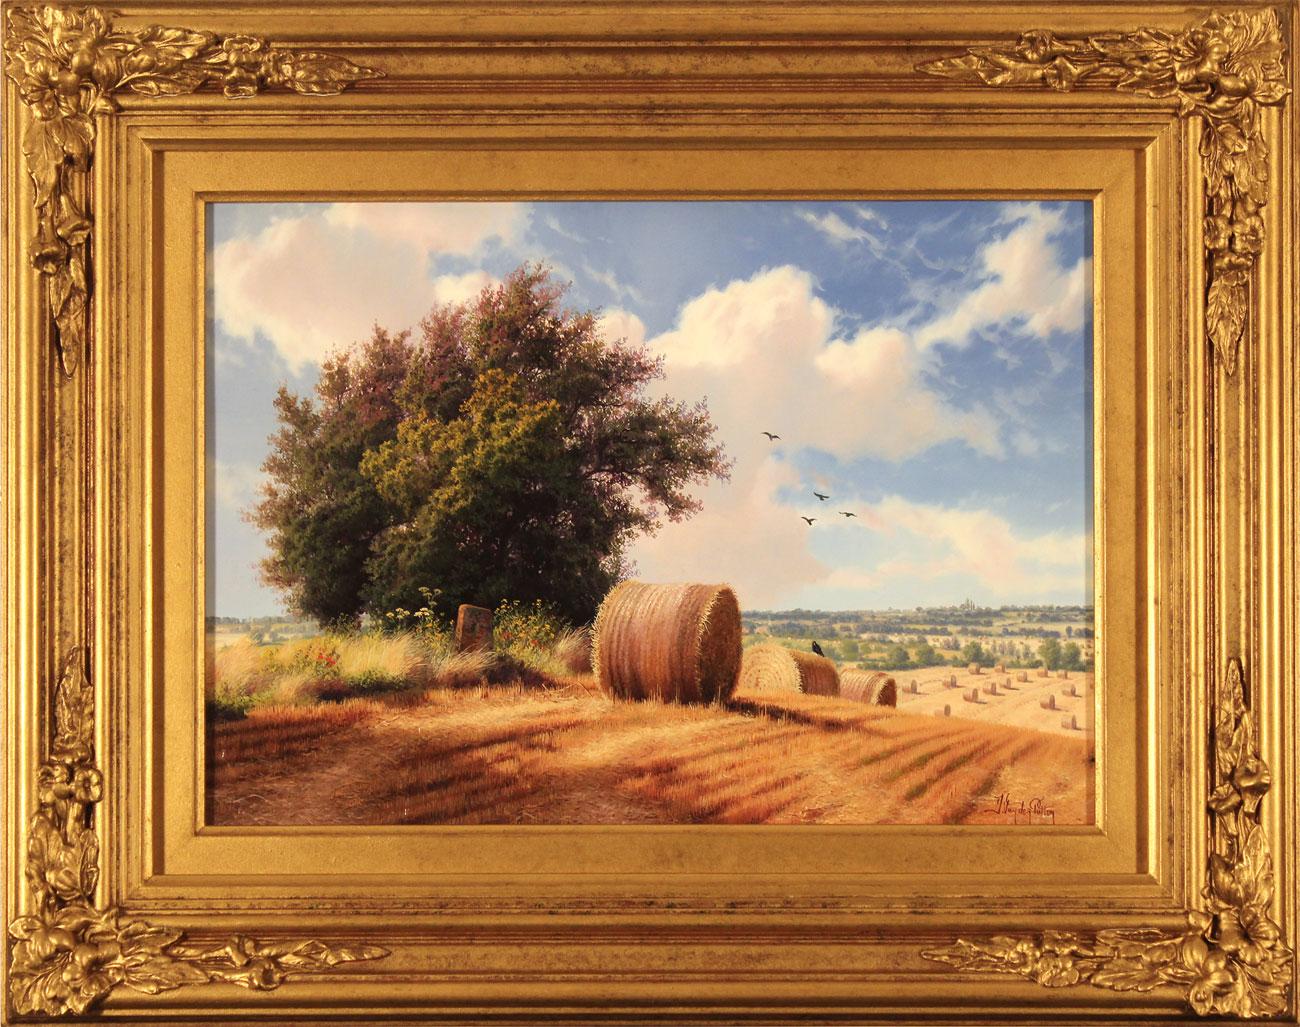 Daniel Van Der Putten, Original oil painting on panel, Summer on Weedon Hill, click to enlarge